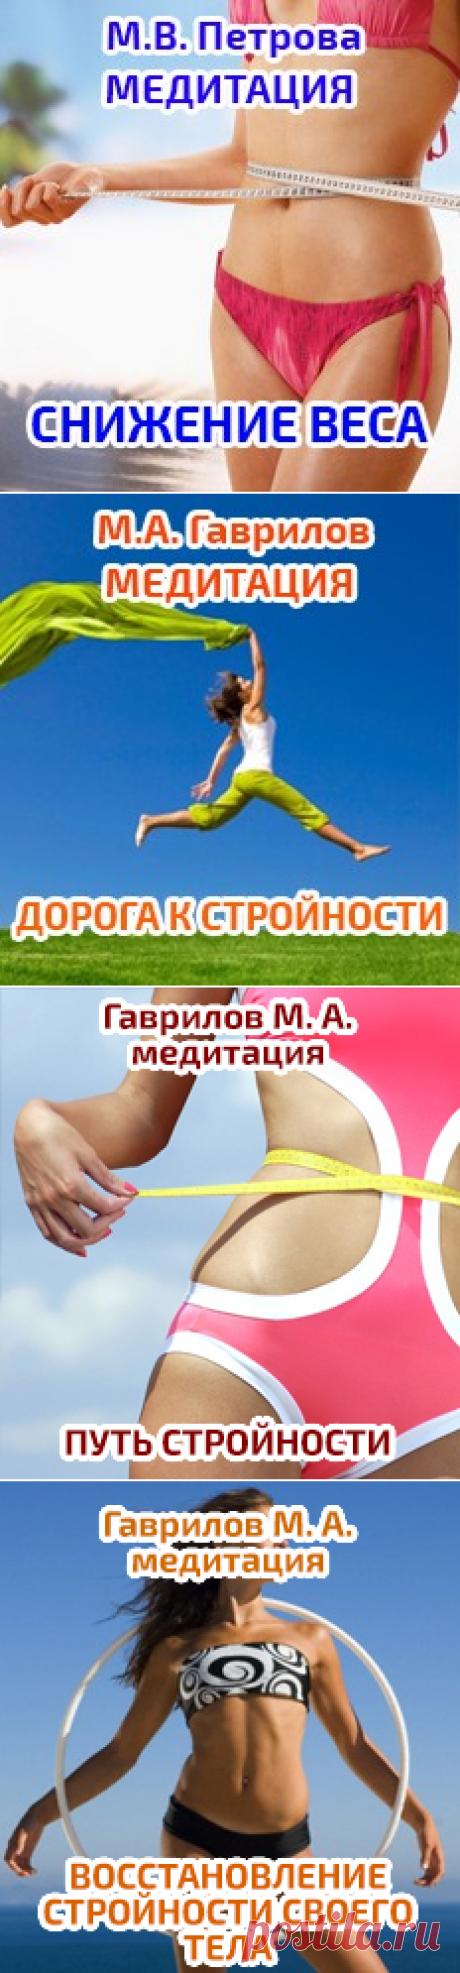 МЕДИТАЦИИ ДЛЯ СНИЖАЮЩИХ ВЕС - Клуб Доктора Гаврилова